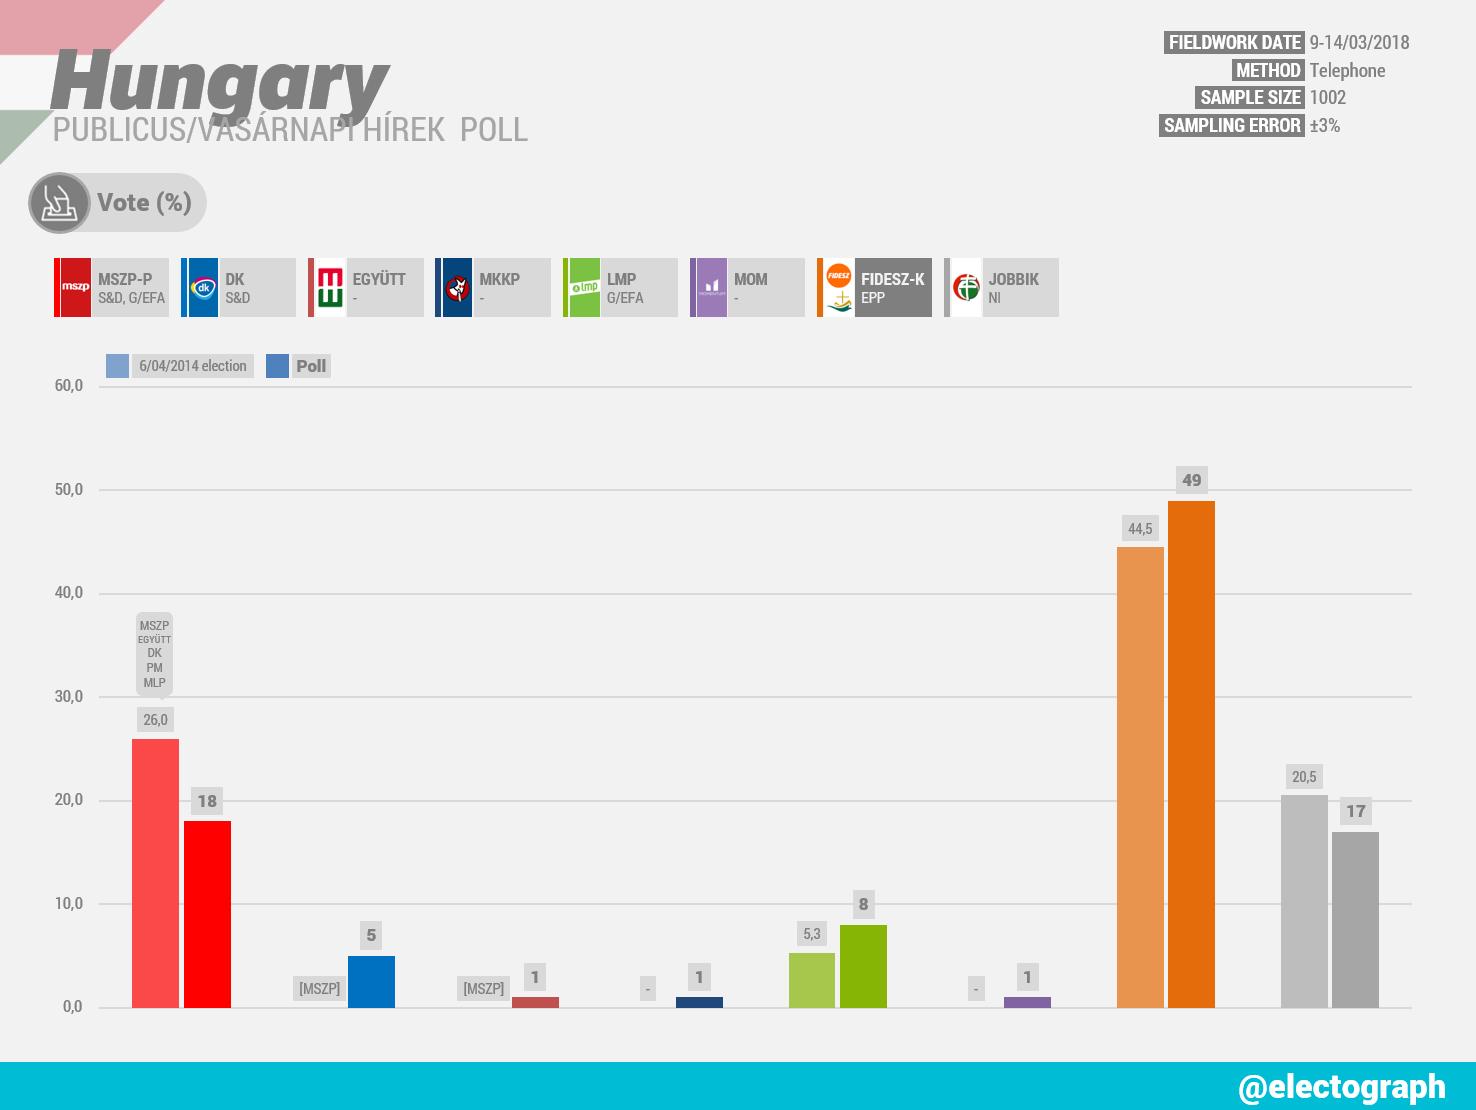 HUNGARY Publicus poll chart for Vasárnapi Hírek, March 2018